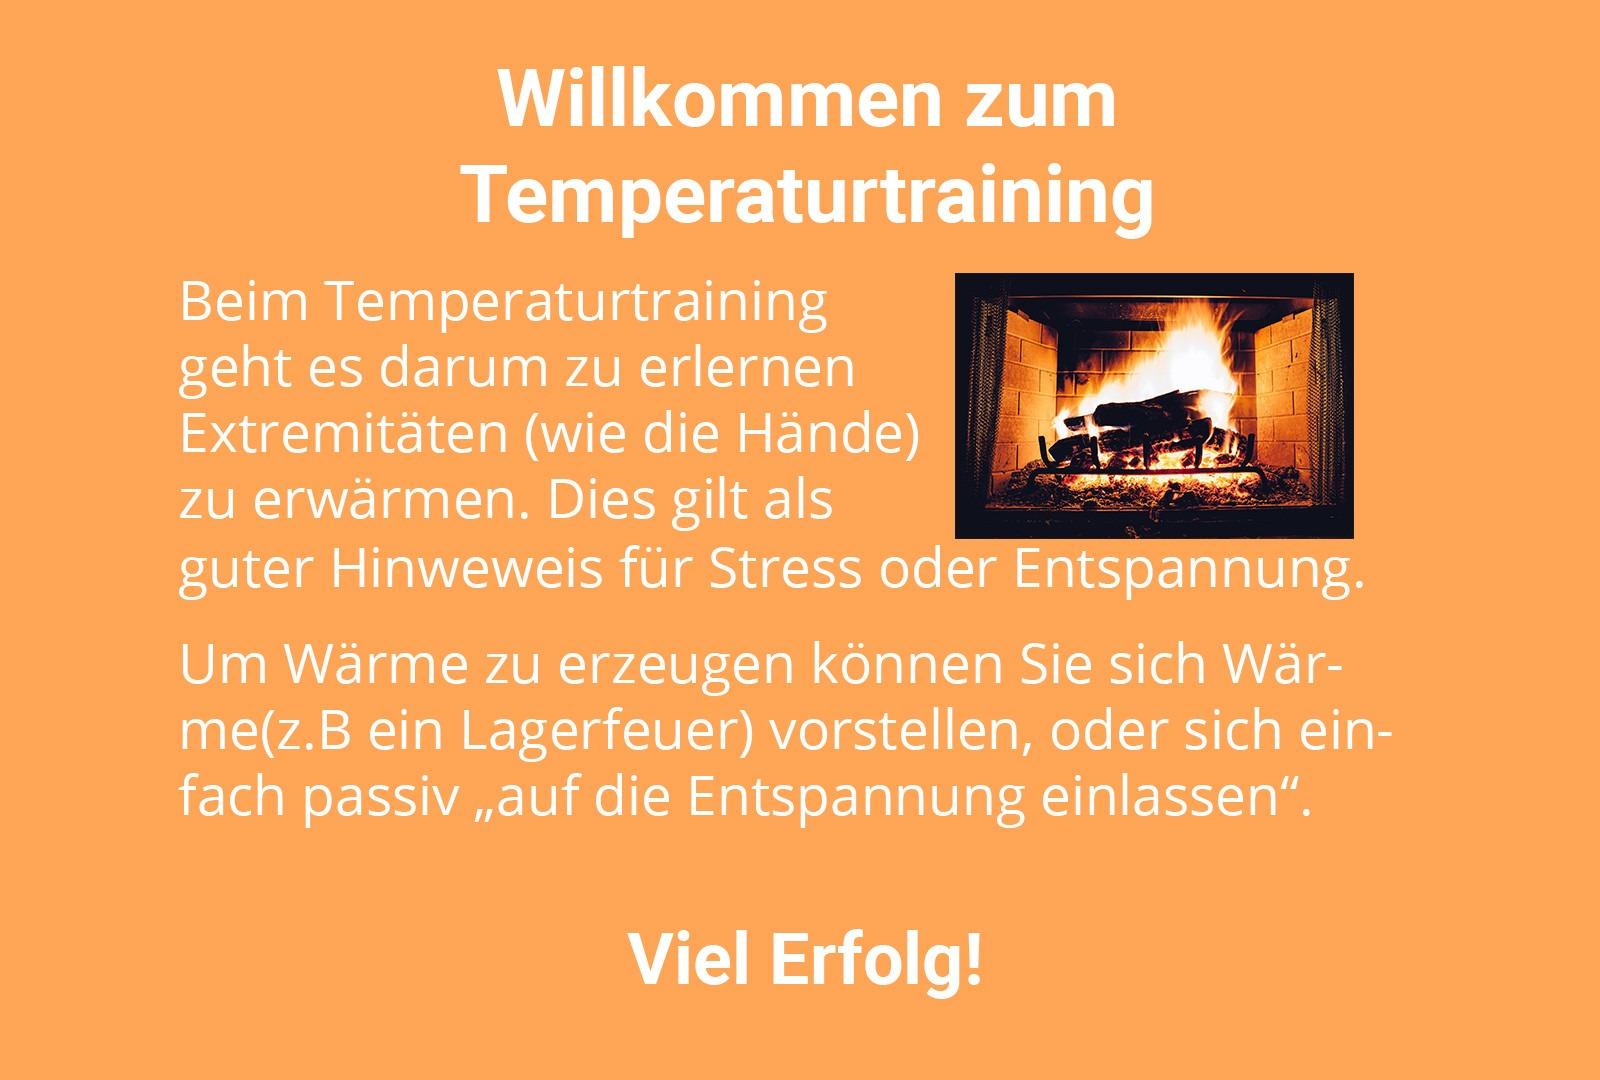 Biofeedback-Vorlage für das Temperatur-Training